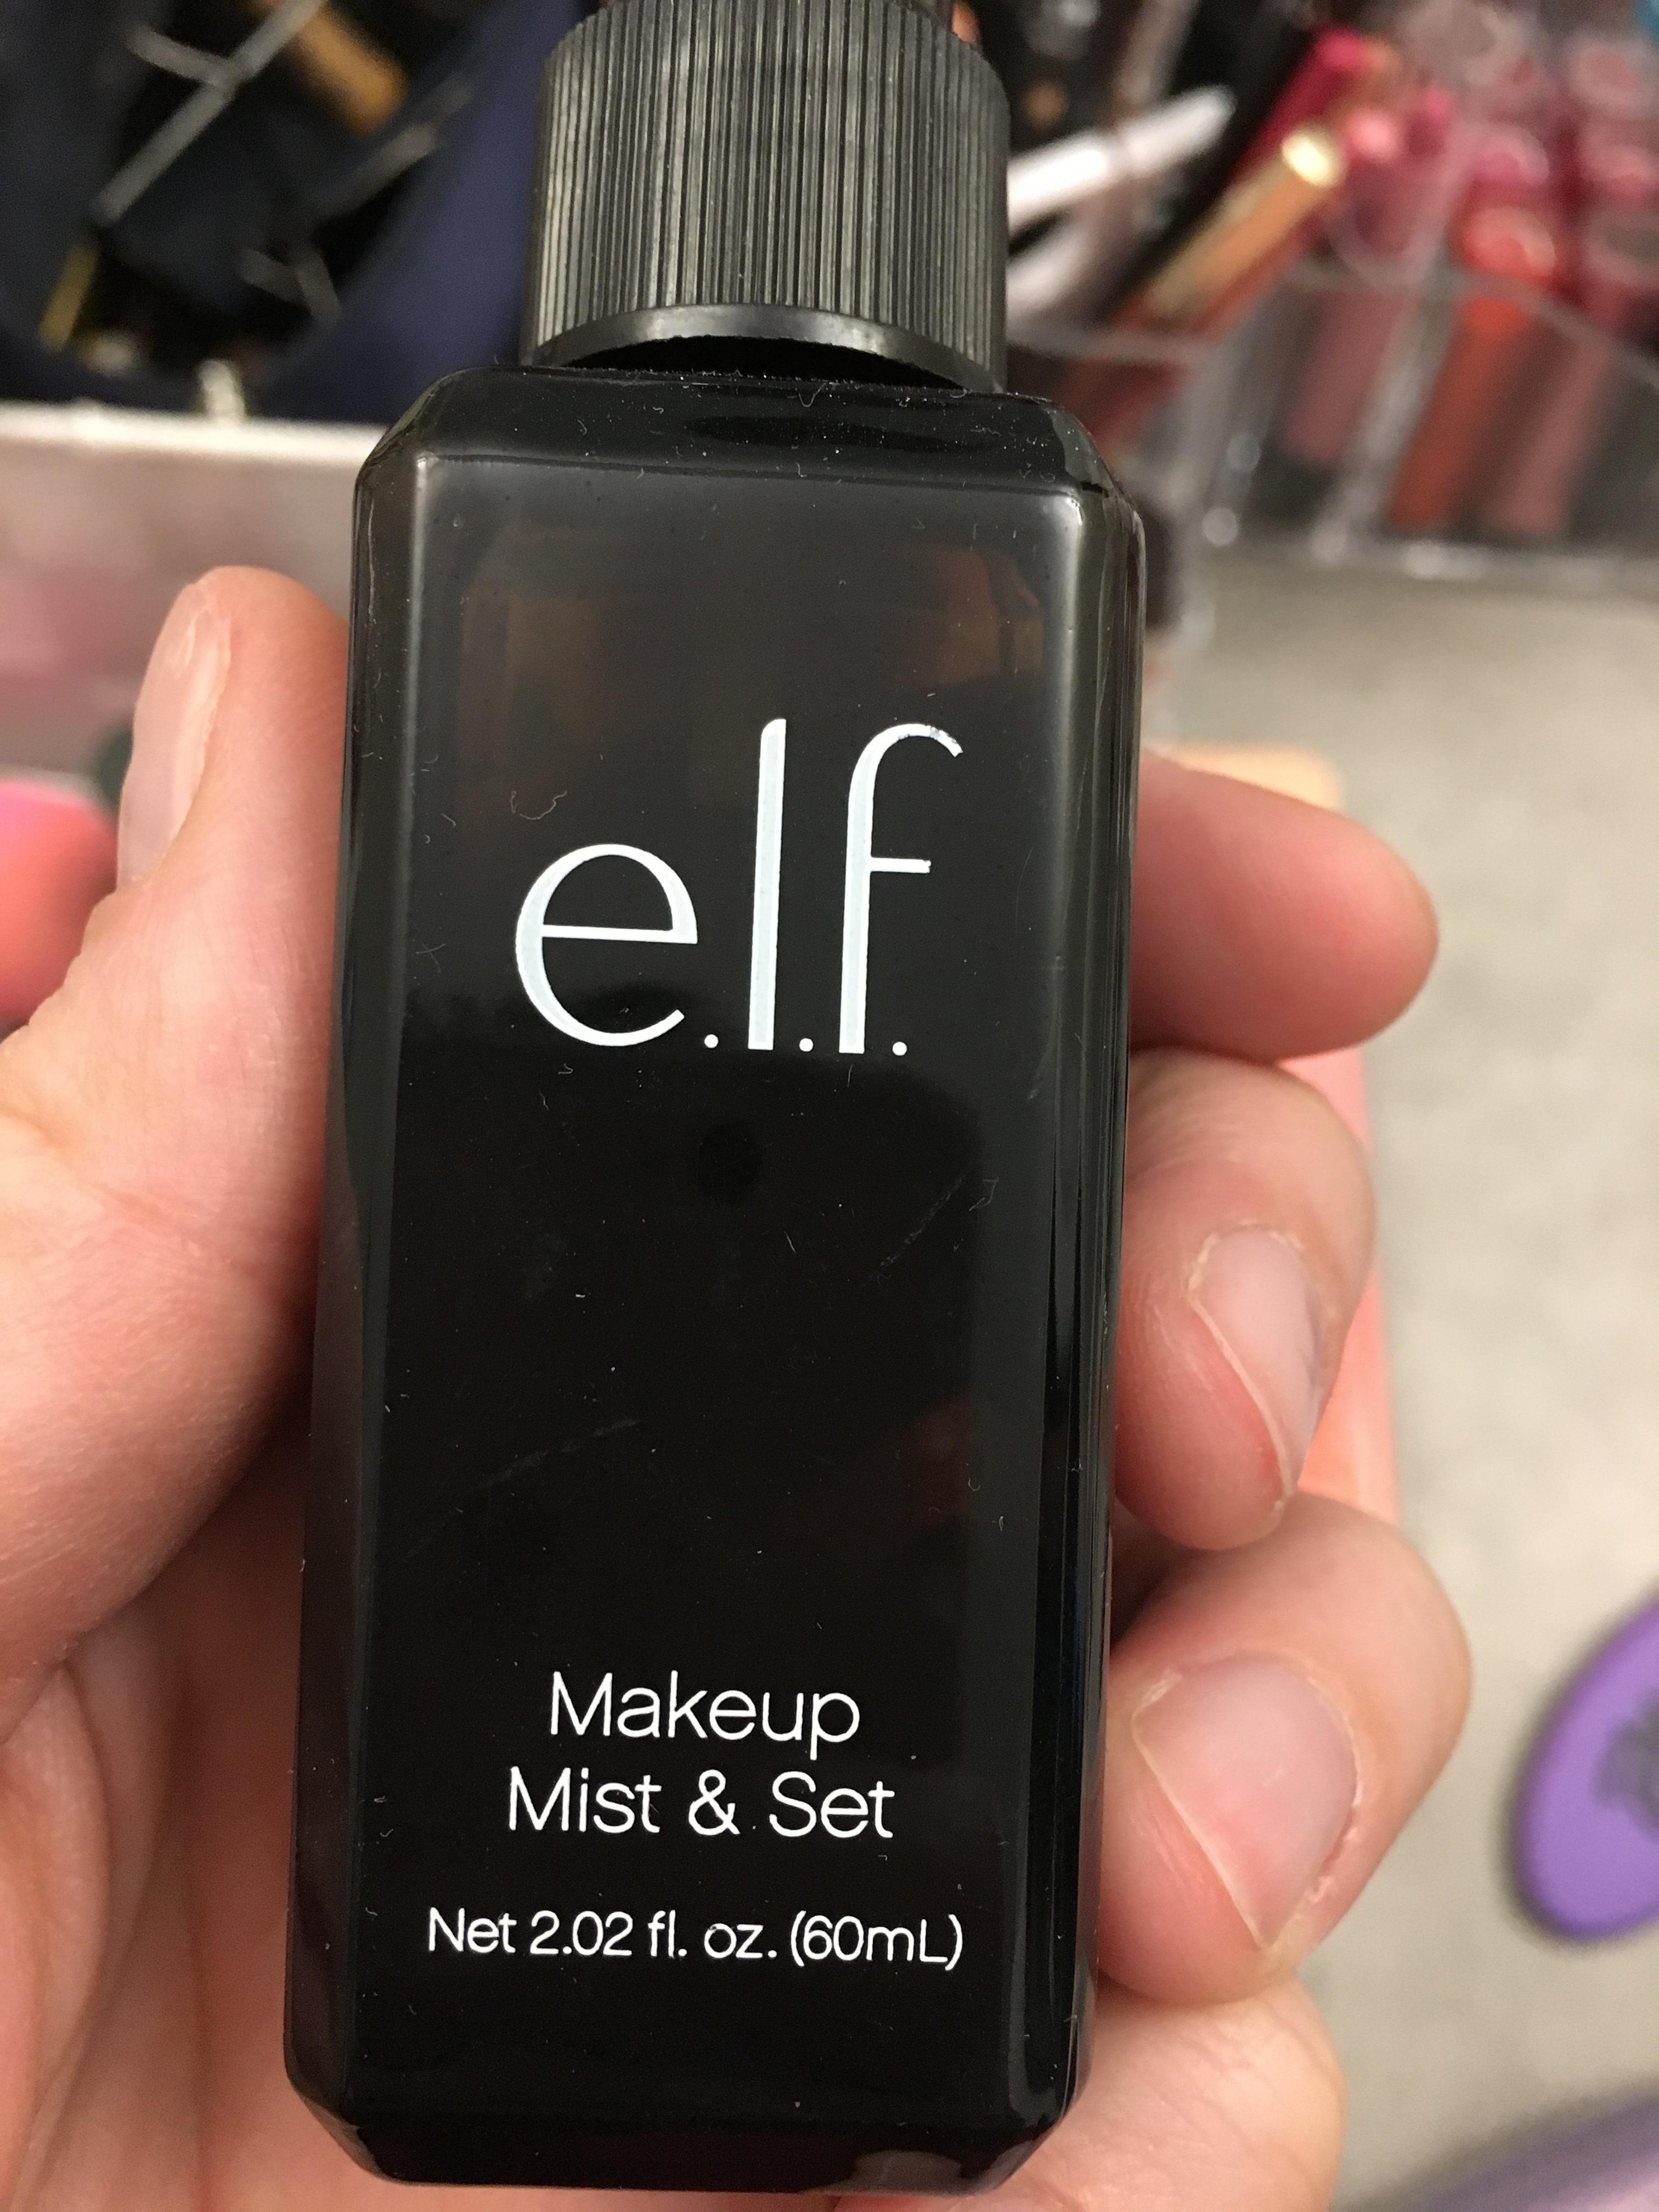 Cosmetics And Makeup: E.l.f. Cosmetics Studio Makeup Mist And Set Spray Reviews